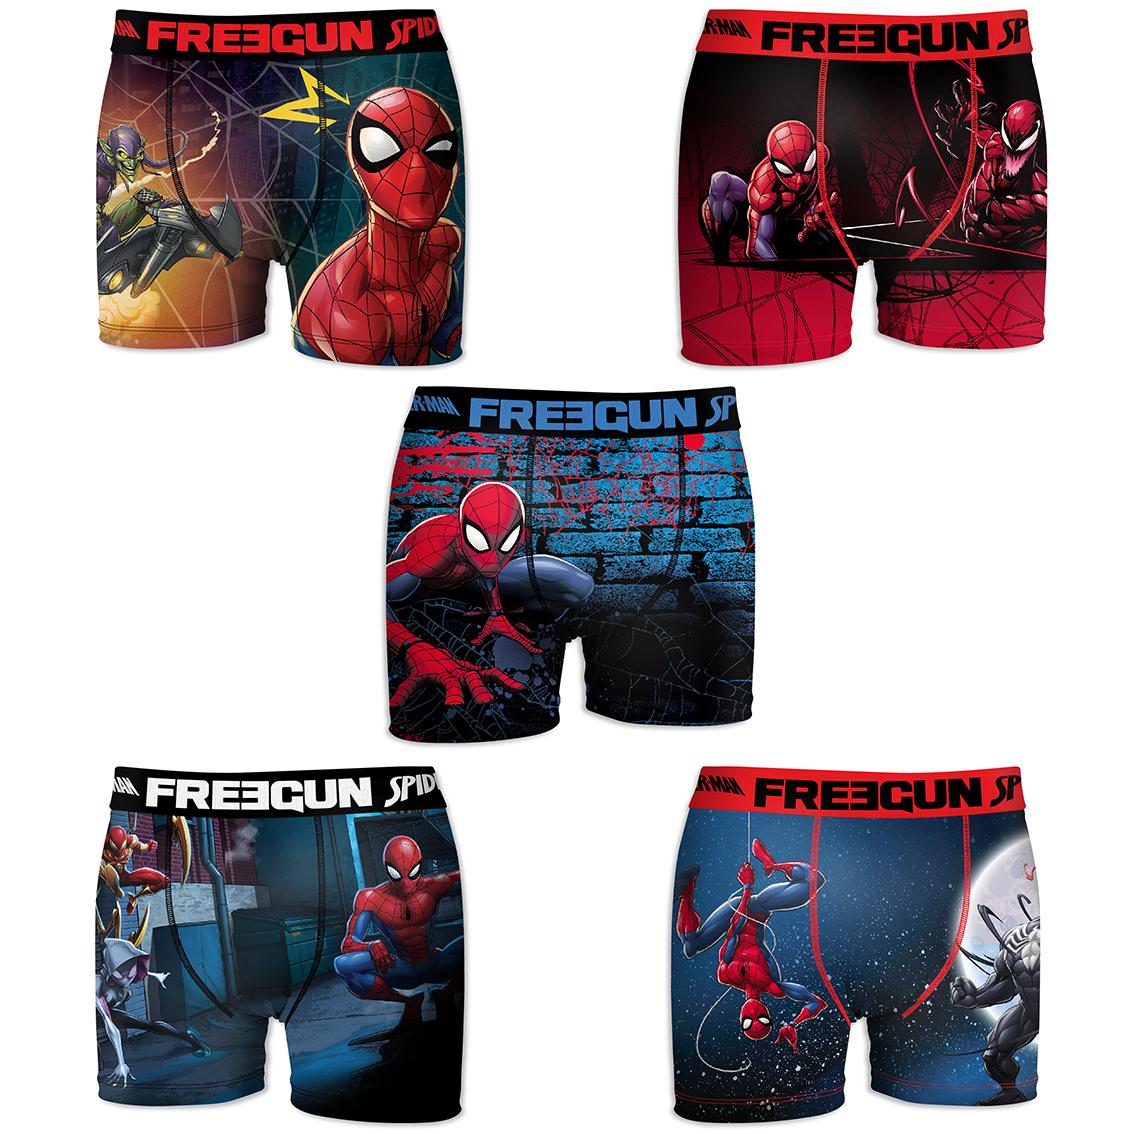 Lot de 5 boxers freegun homme spider man savior